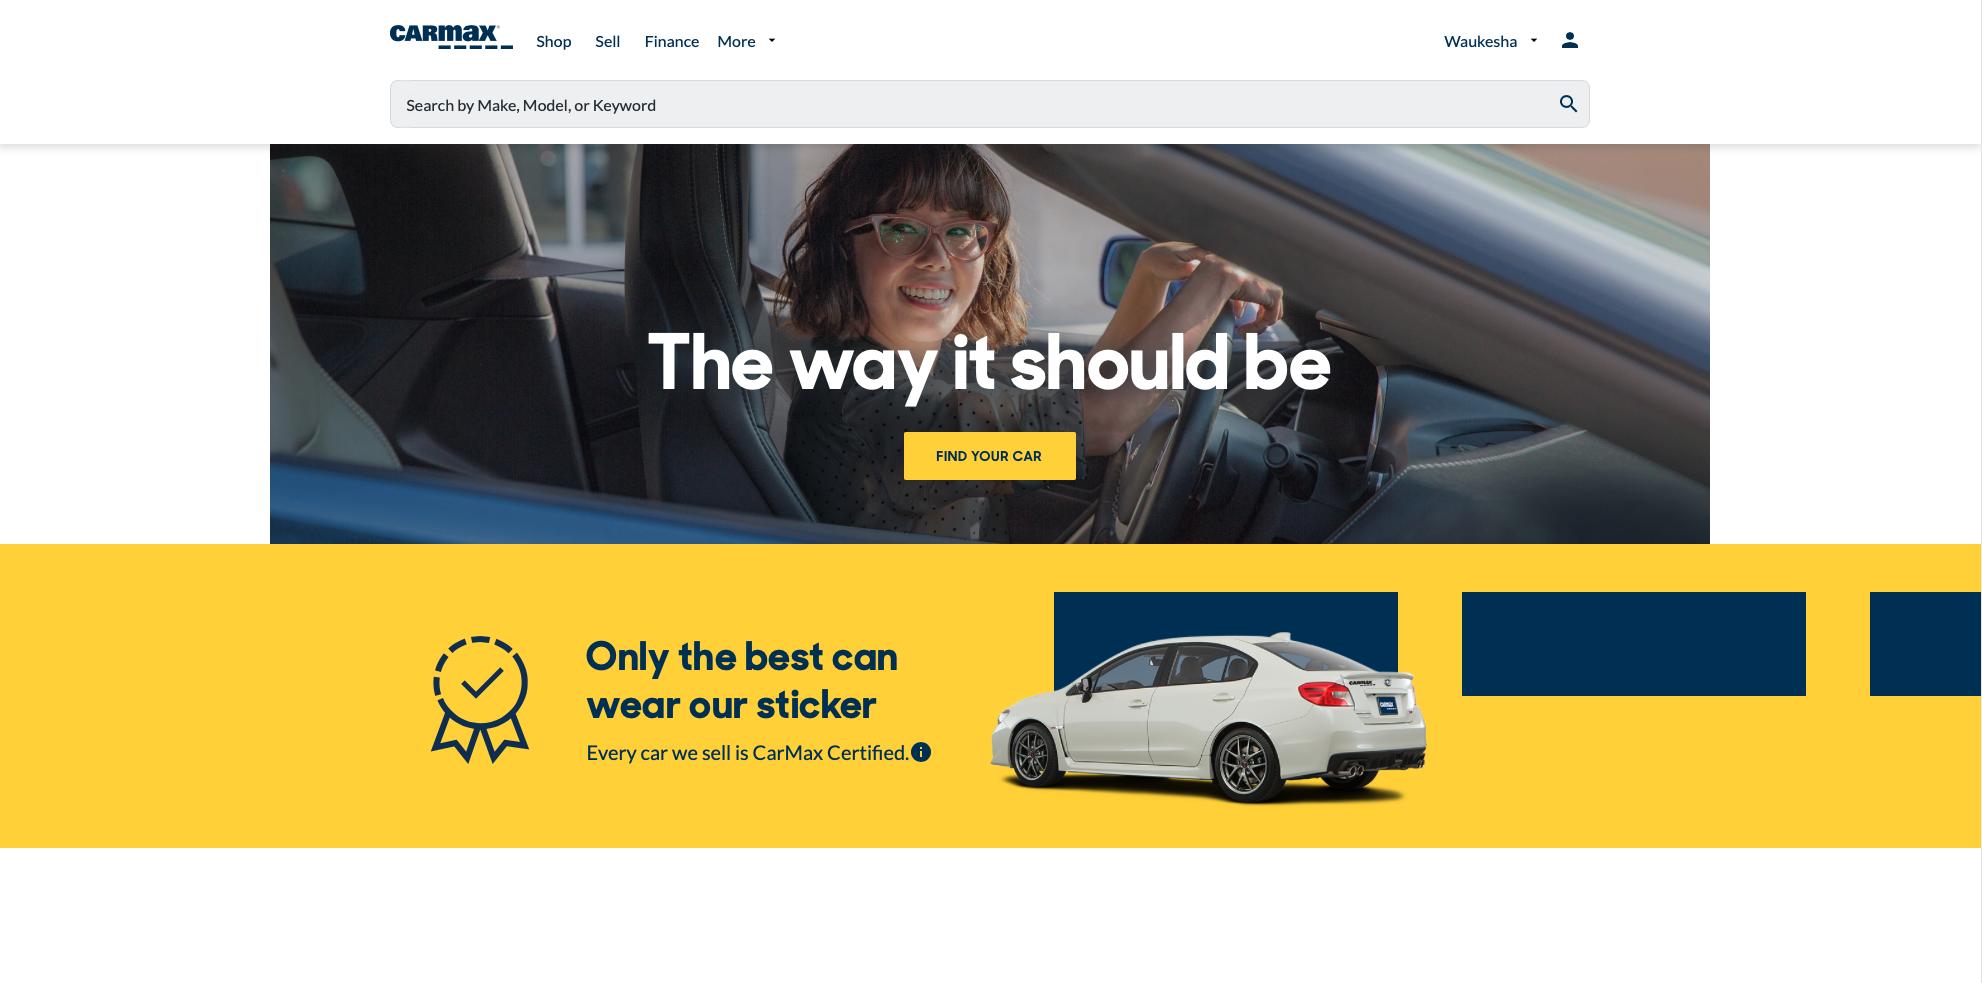 CarMax's website